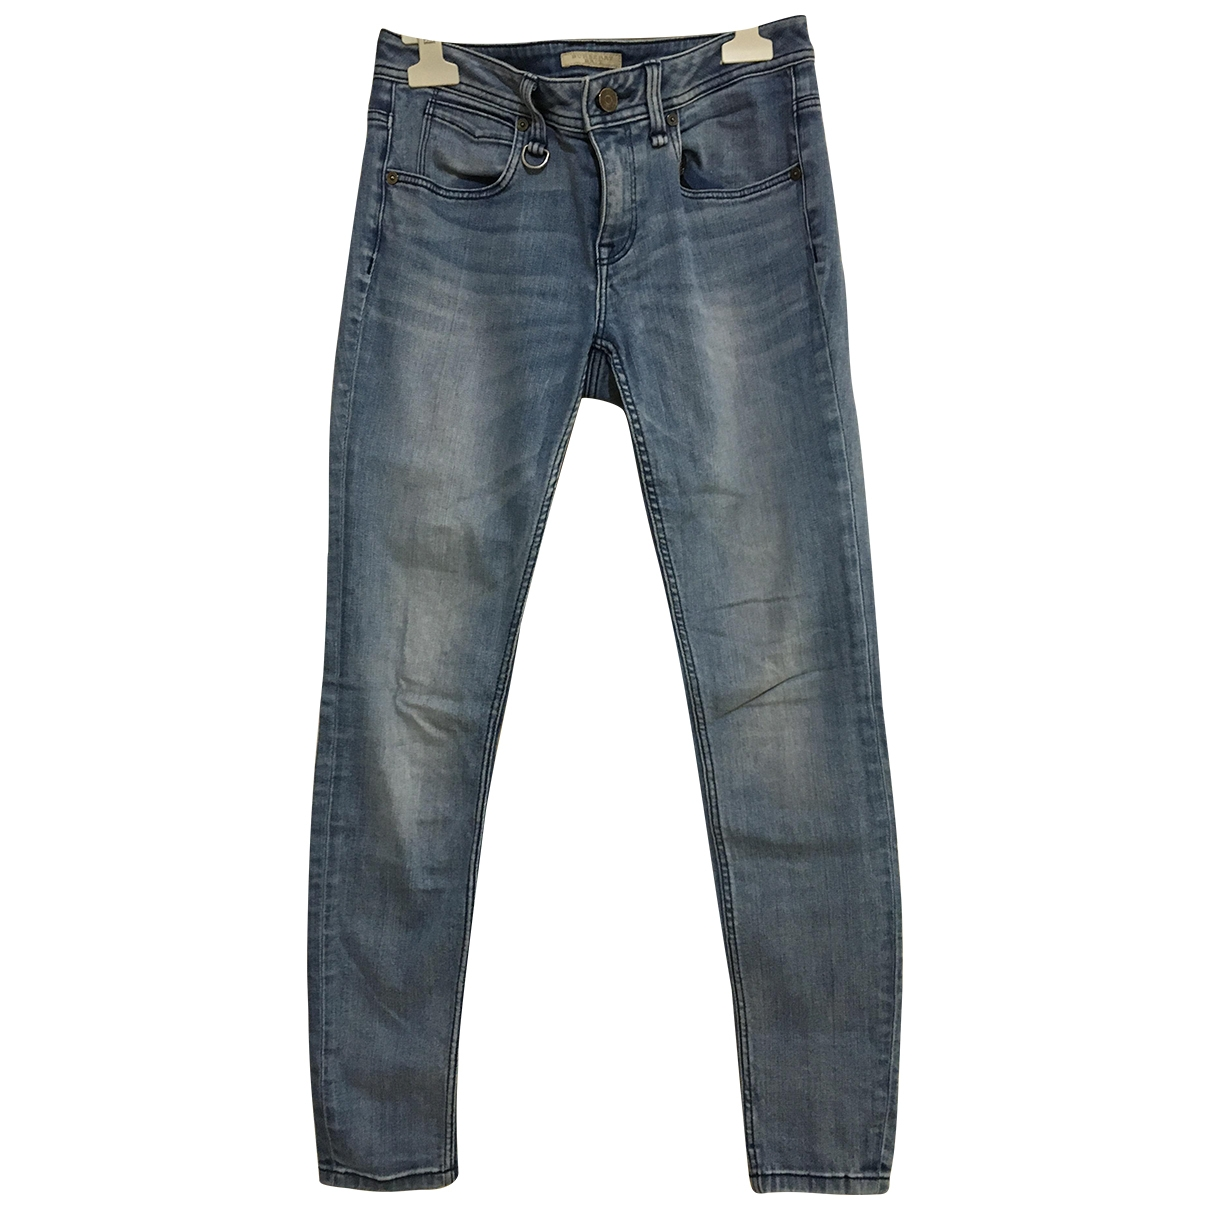 Burberry \N Blue Denim - Jeans Jeans for Women 26 US